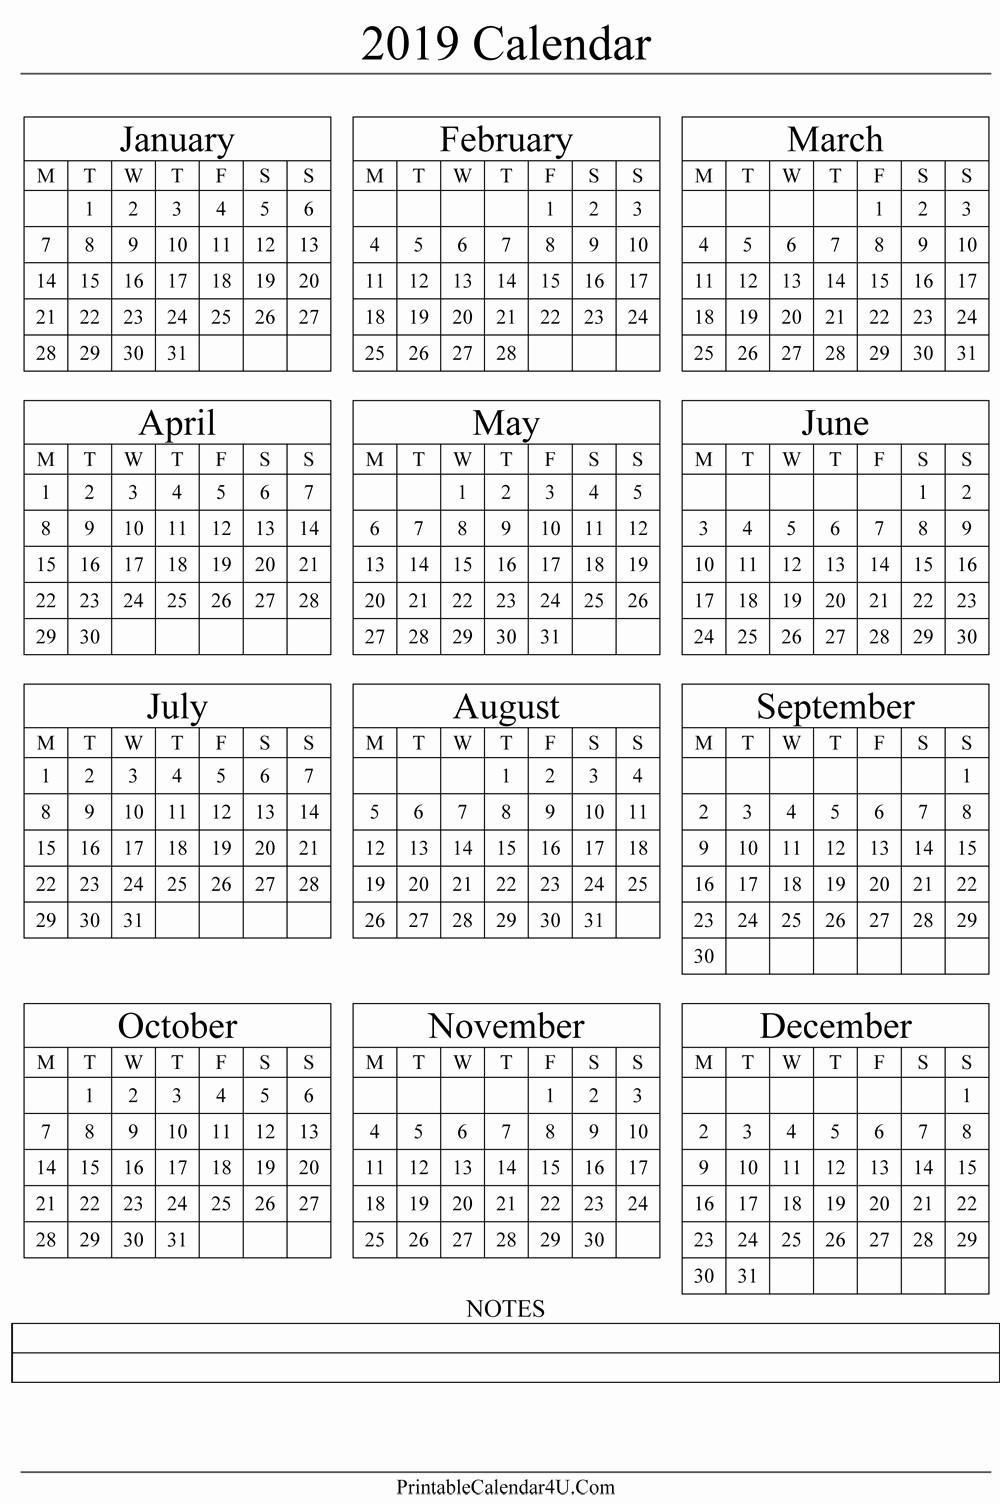 2017-2018 Blank Calendar Beautiful 2019 Blank Yearly Calendar Template